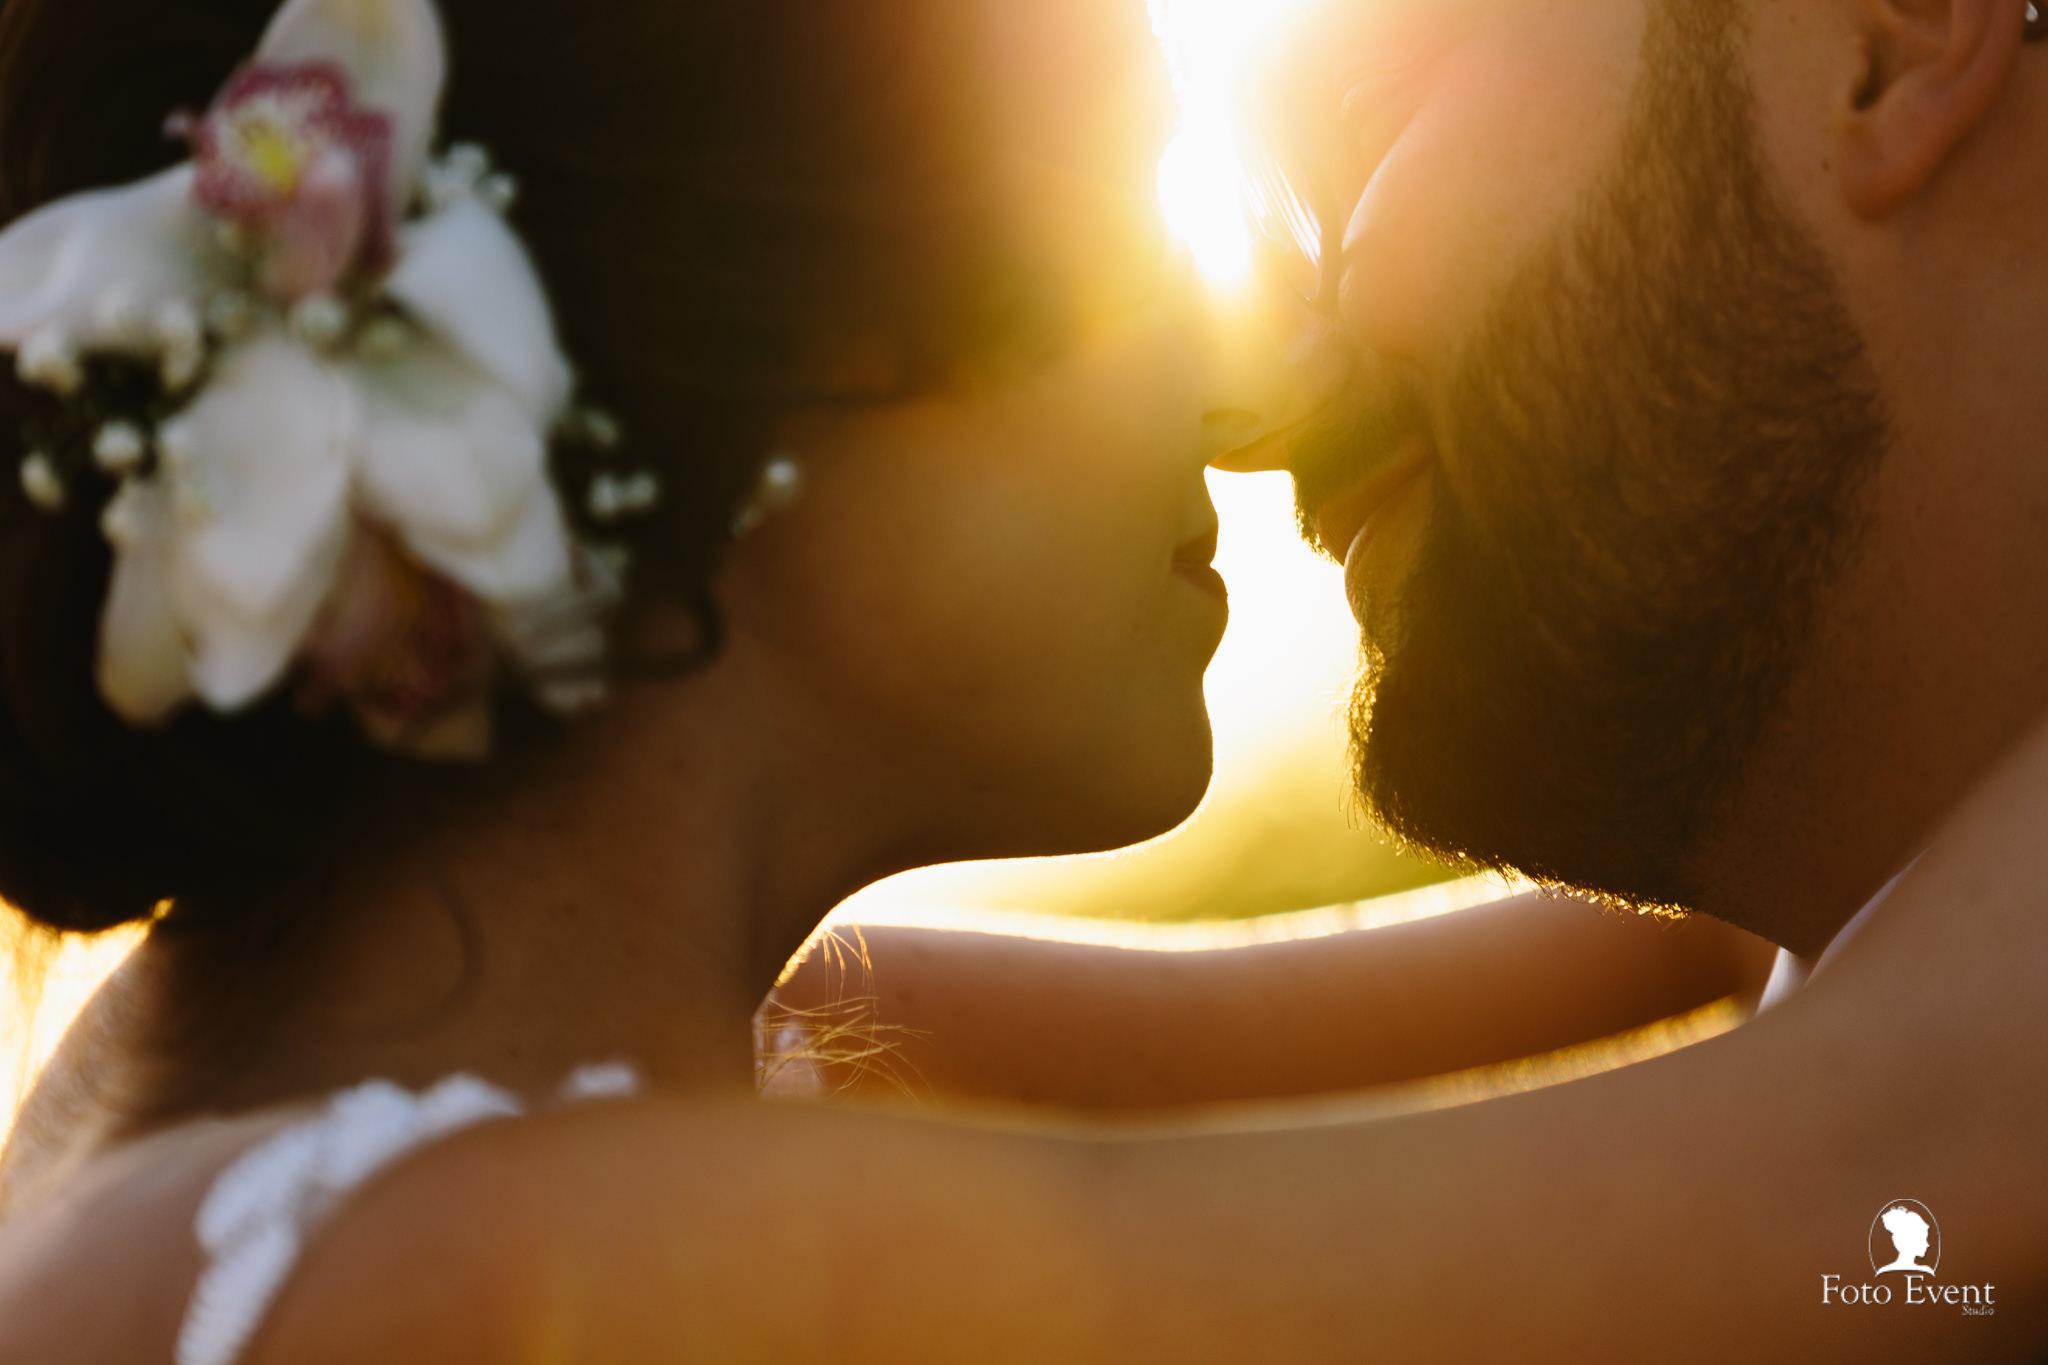 032-2019-09-09-Matrimonio-Dorotea-e-Alberto-Iemmolo-zoom-535